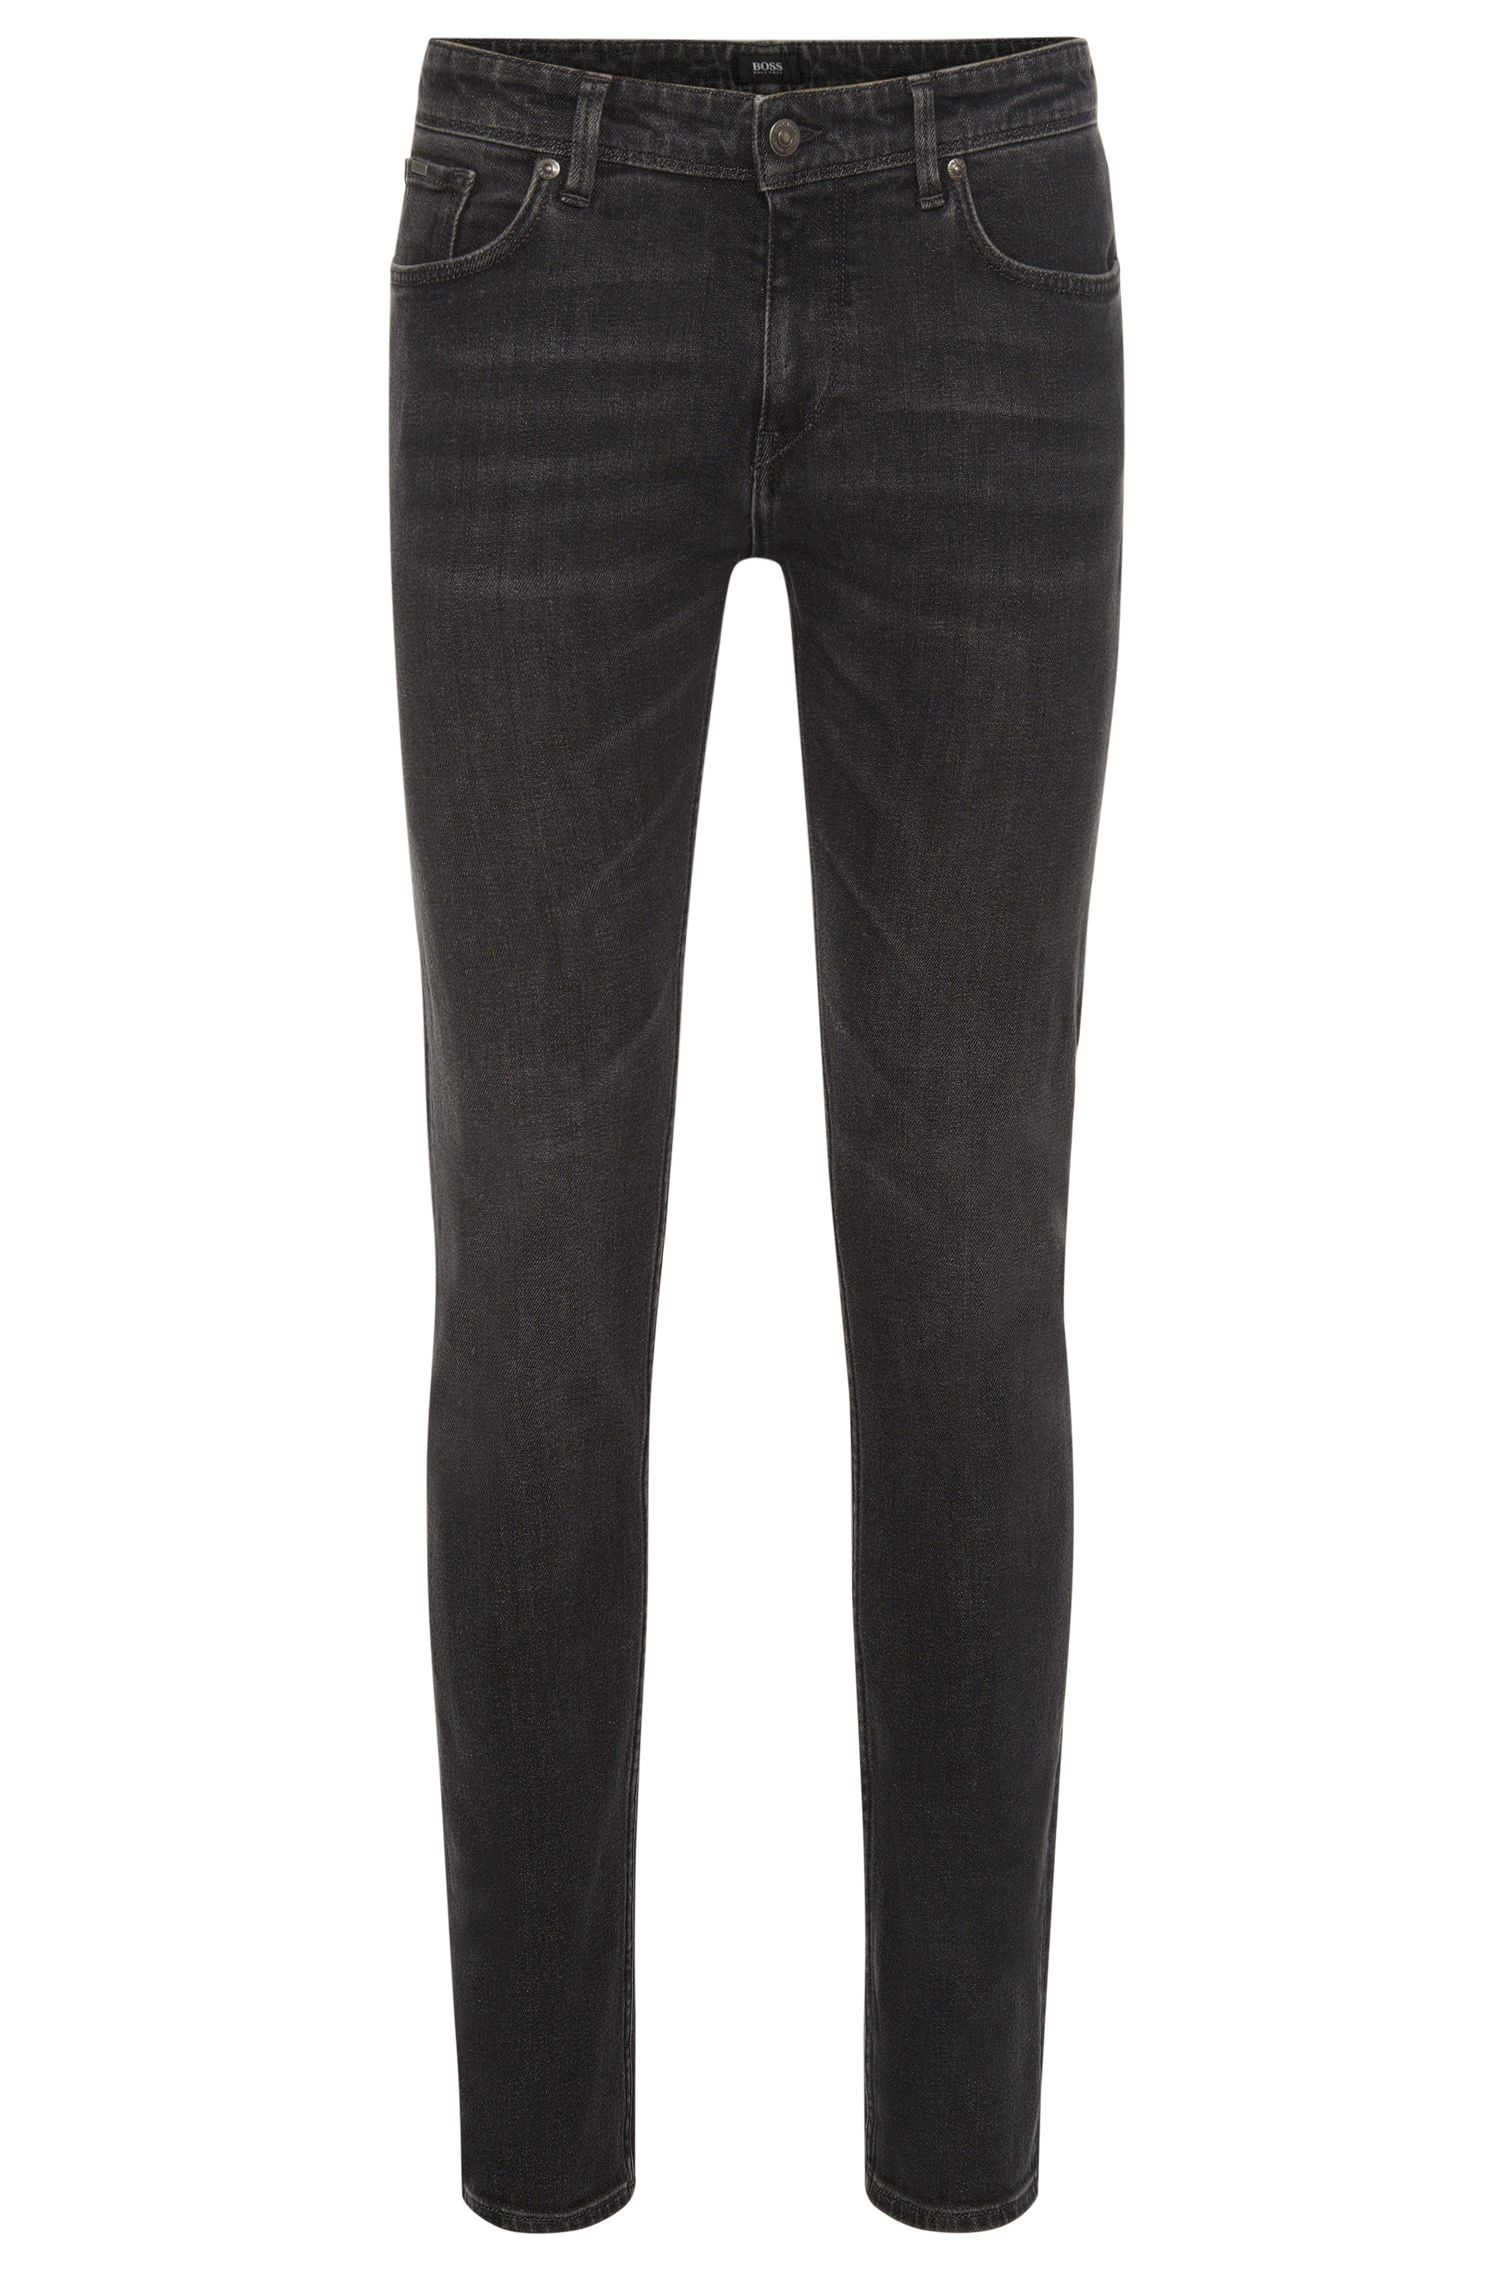 Stretch Cotton Jean, Slim Fit | Charleston, Charcoal